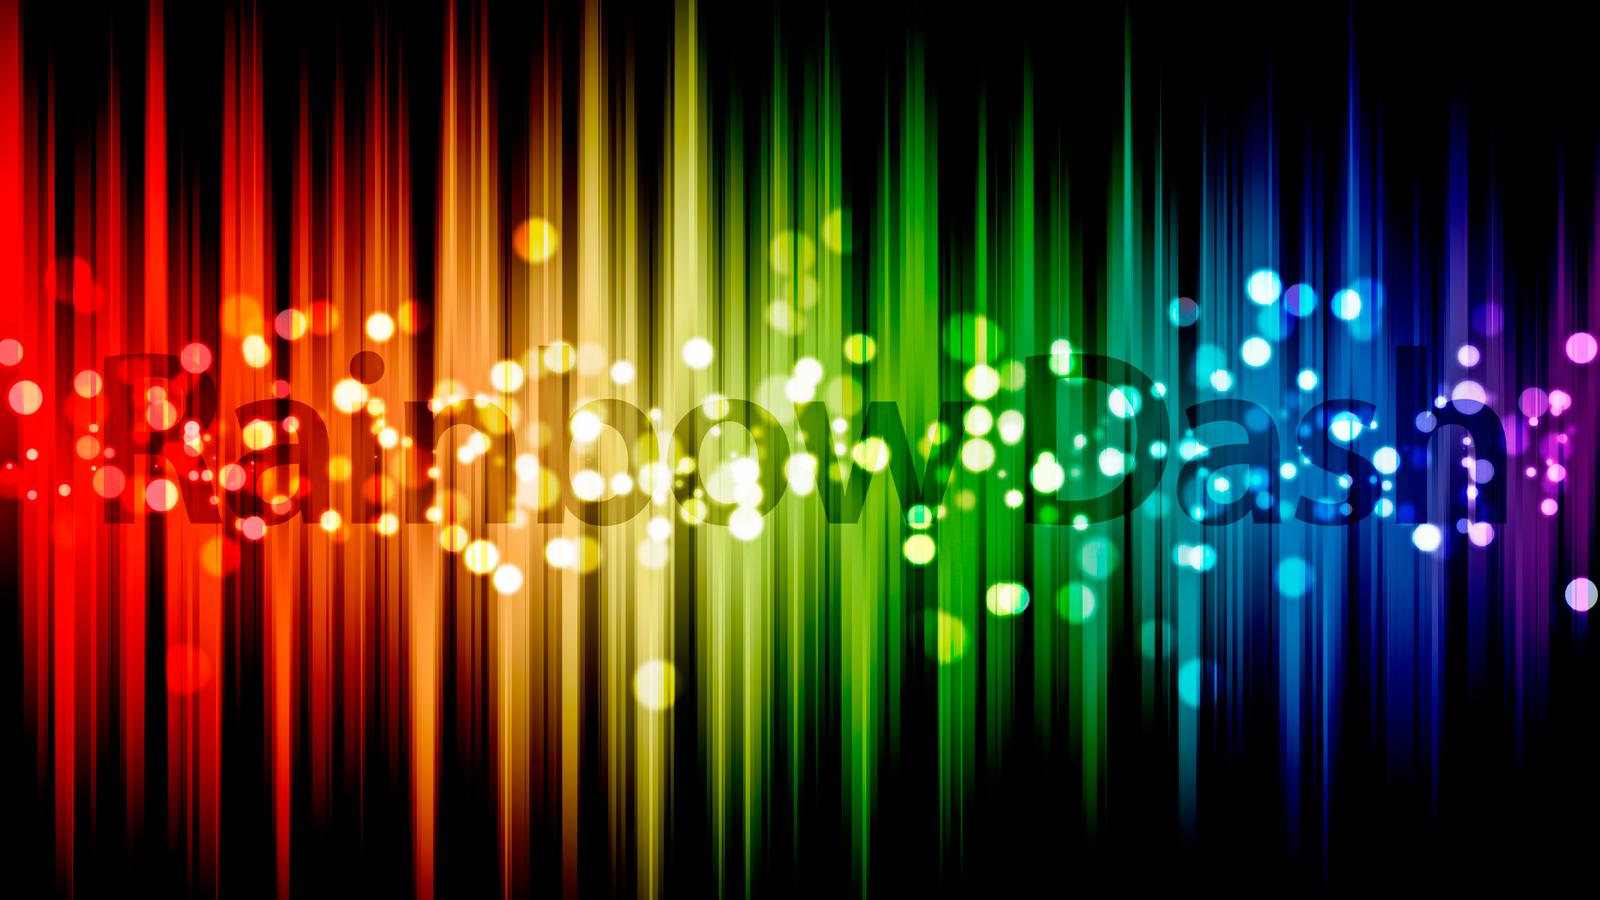 rainbow dash name wallpaperalanfernandoflores01 on deviantart